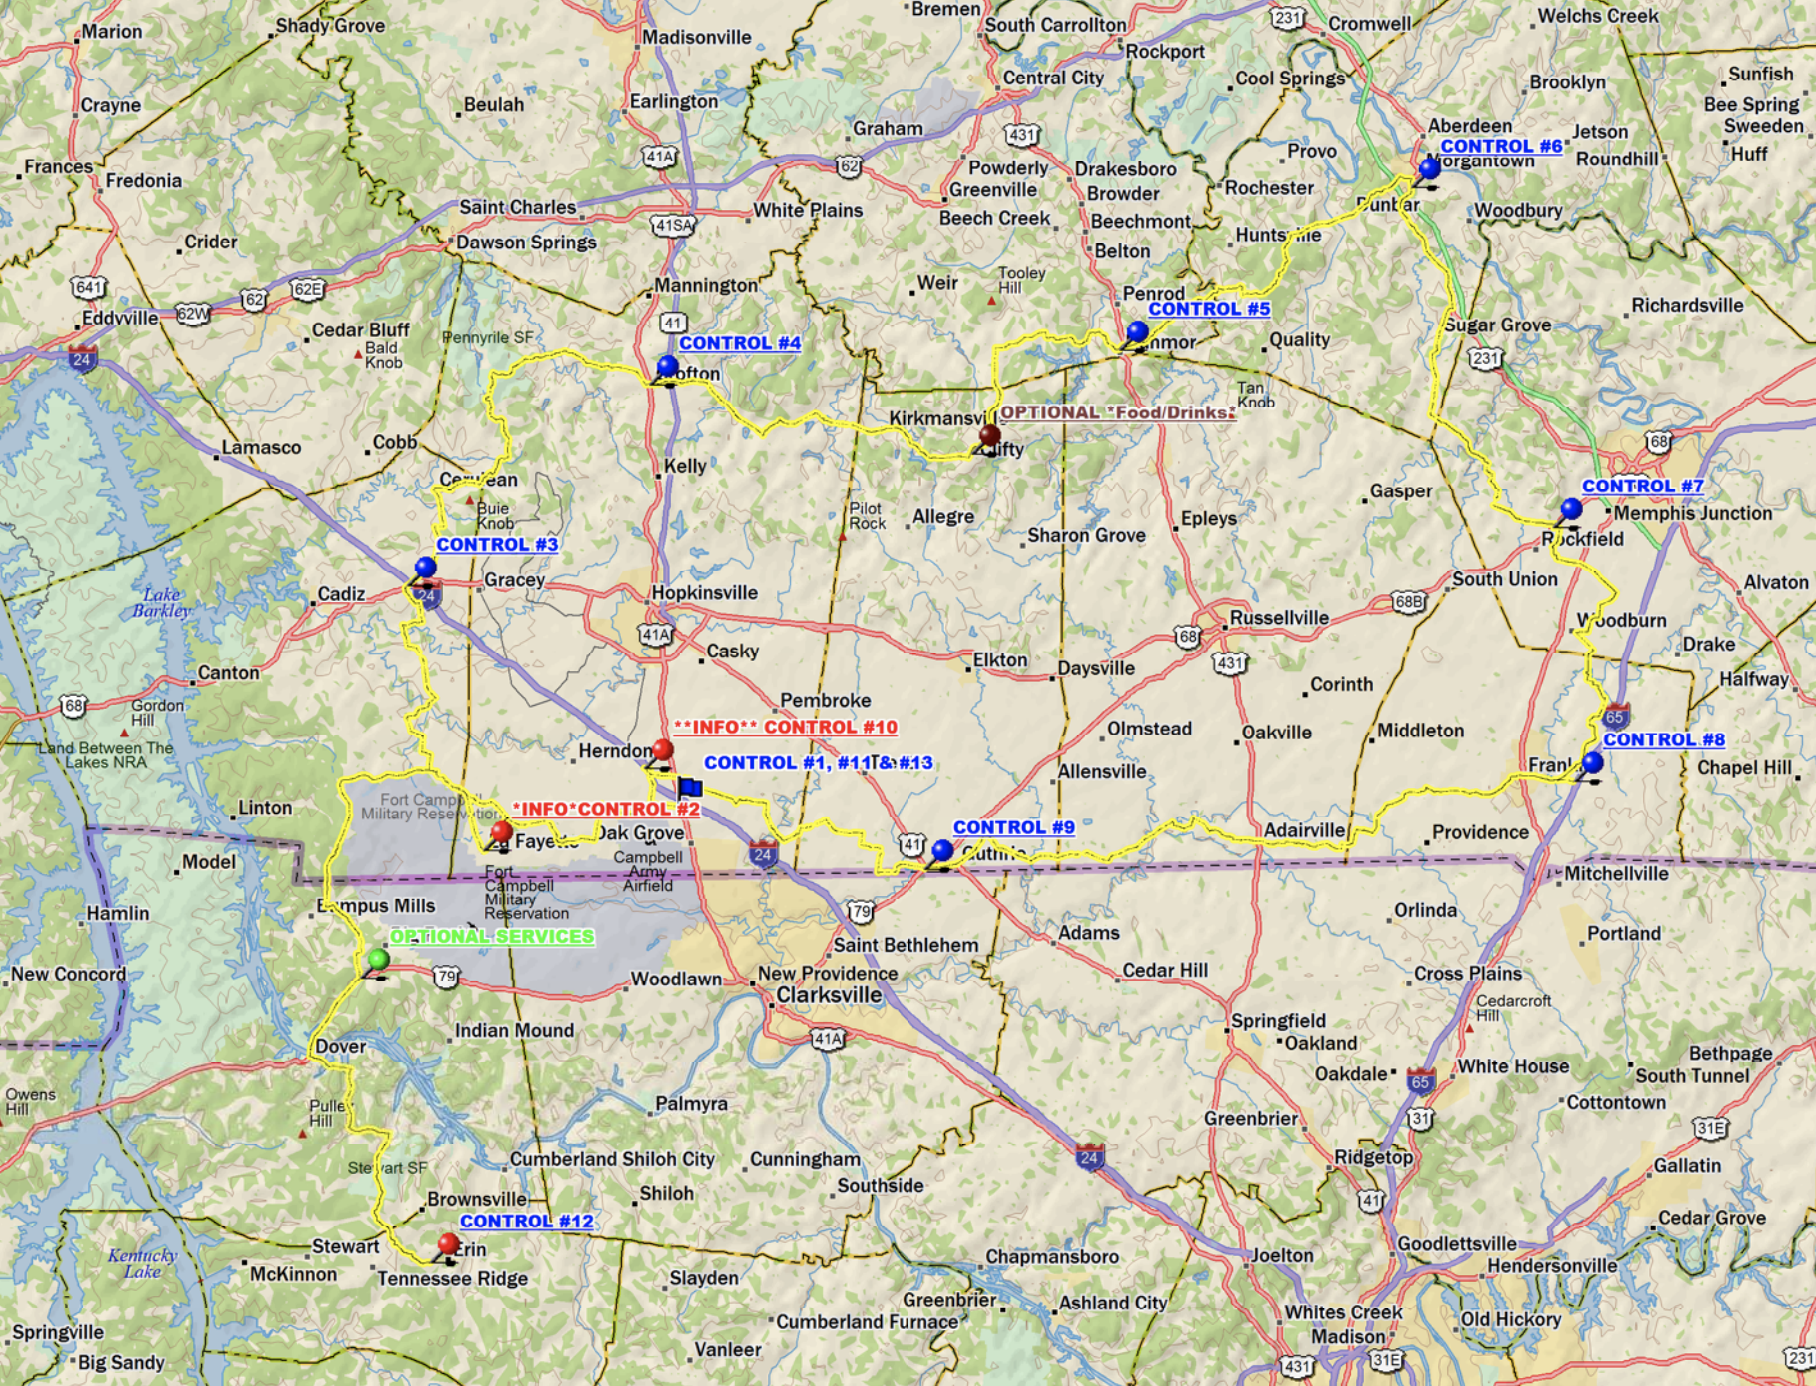 Oak Grove 200K, 400K & 600K - April 27, 2019200k: Ride With GPS Route400k: Ride With GPS Route400k: PDF Route600k: Ride With GPS Route600k: PDF RouteDirections to Oak Grove, KYRecommended Hotel: Sleep Inn in Oak Grove